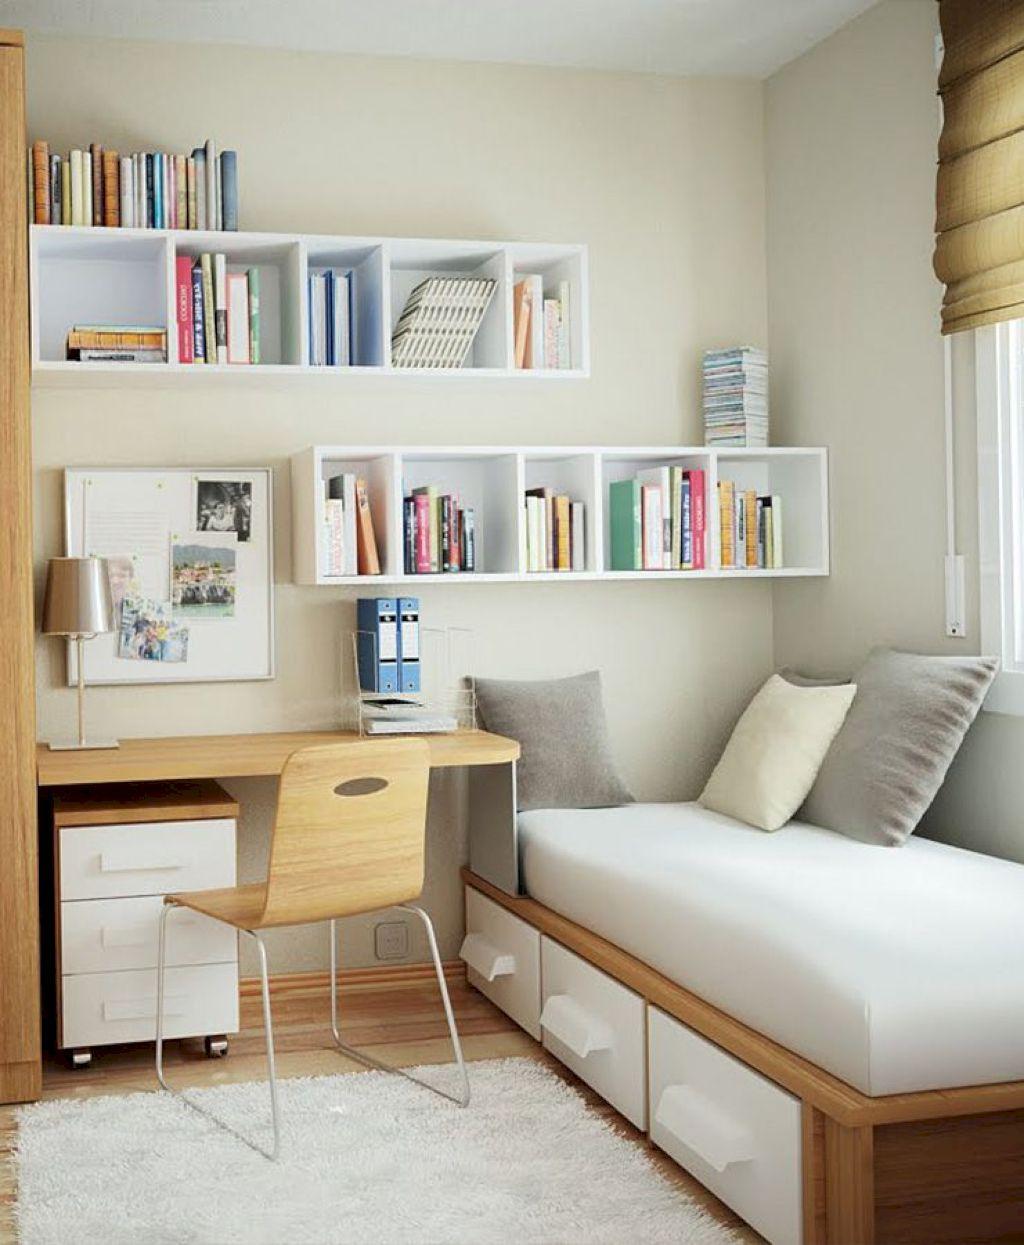 Dorm Room Decorating